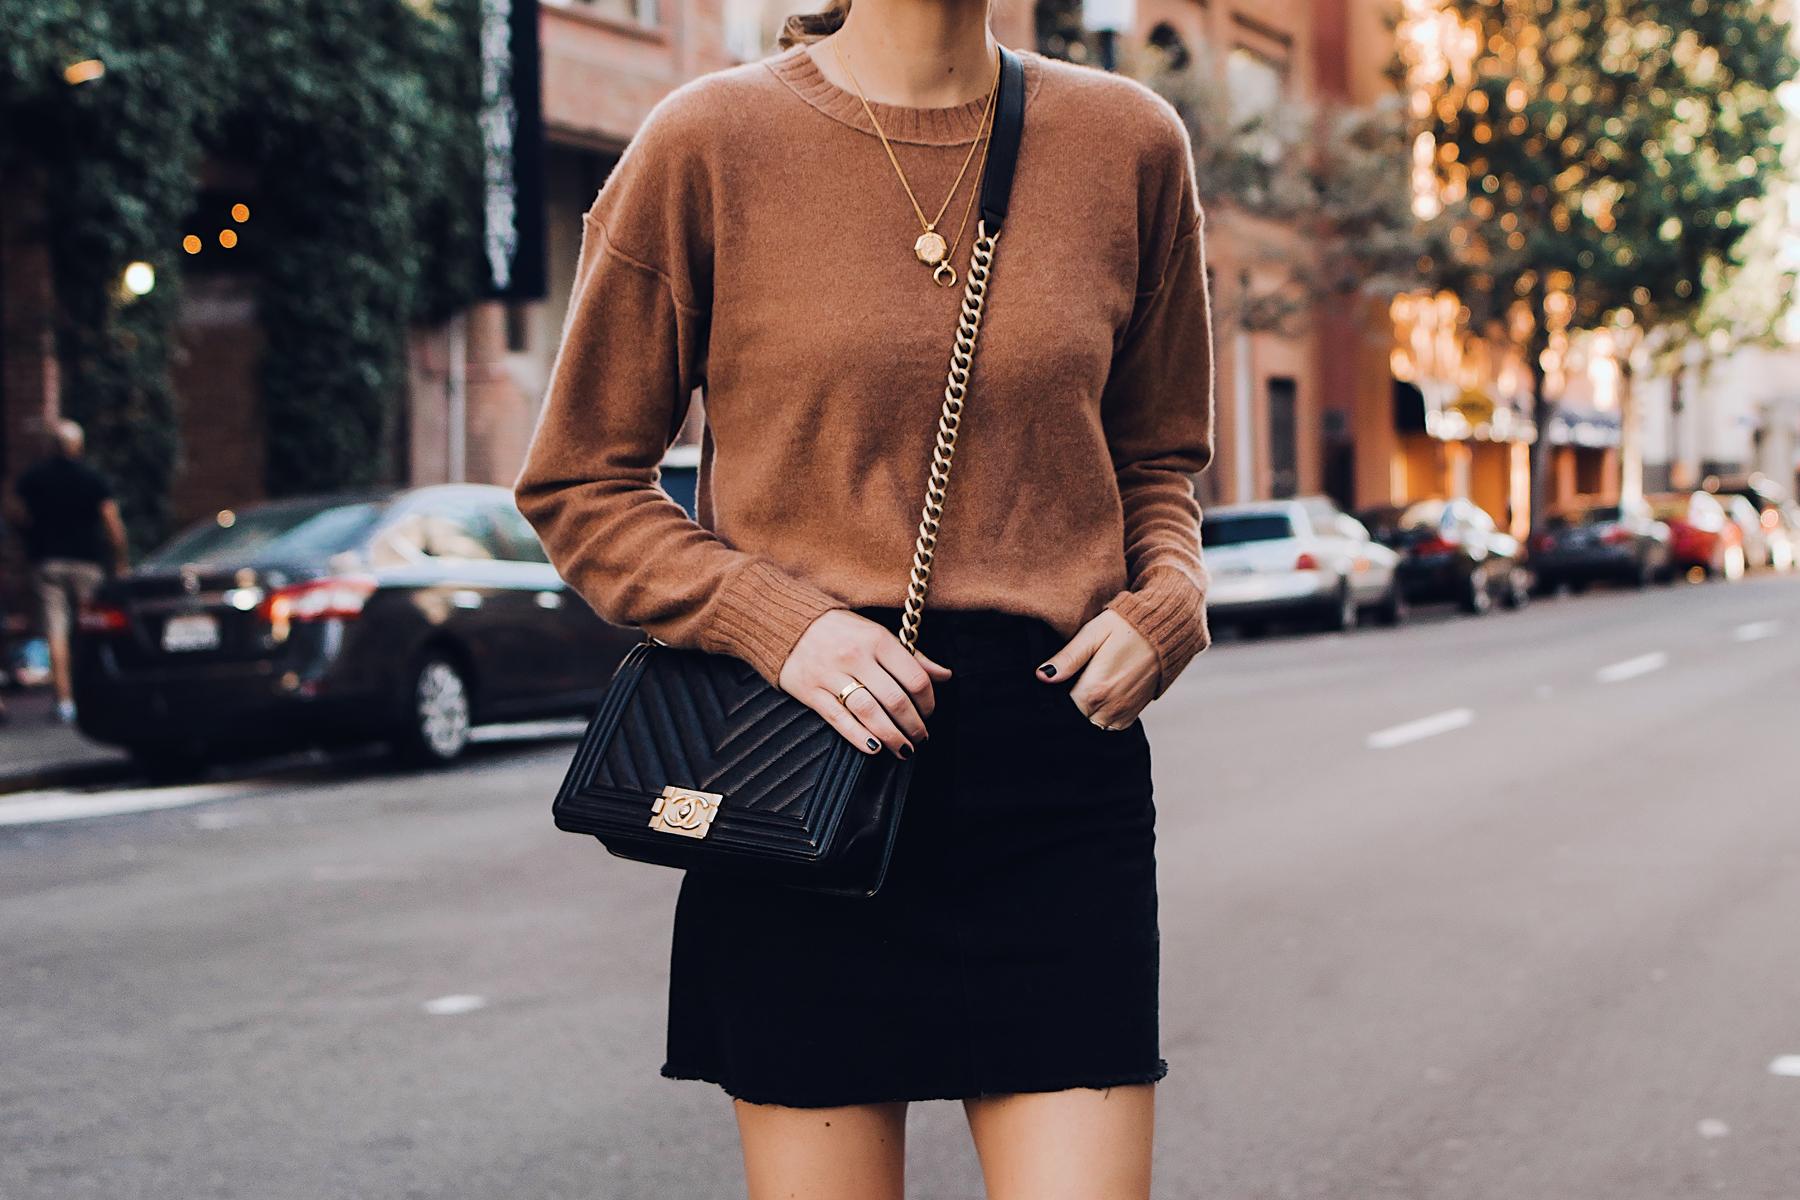 Woman Wearing Free People Tan Sweater Black Denim Skirt Chanel Black Boy Bag Gold Layered Necklaces Fashion Jackson San Diego Fashion Blogger Street Style